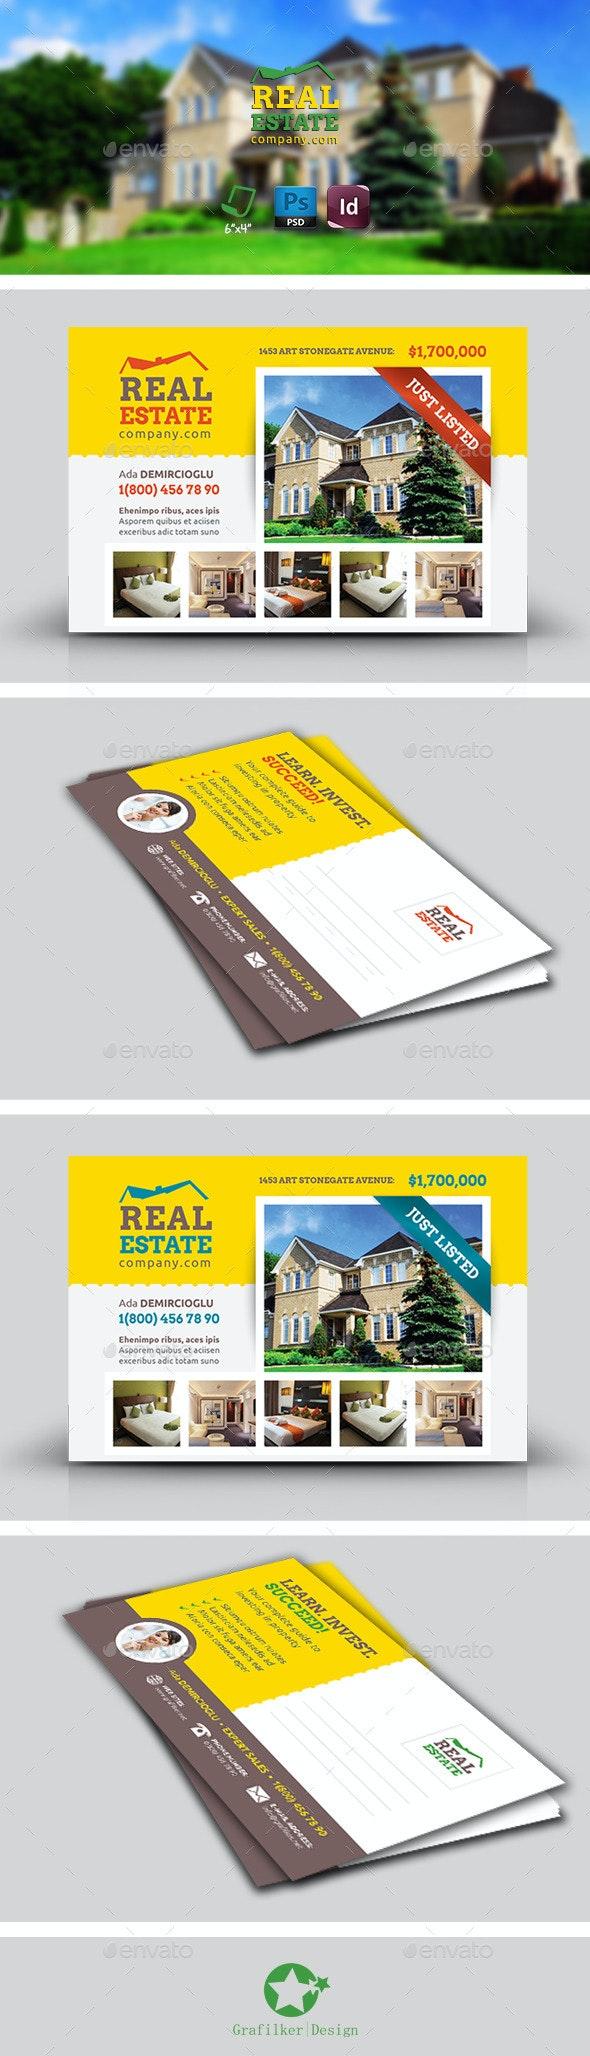 Real Estate Postcard Templates - Corporate Flyers